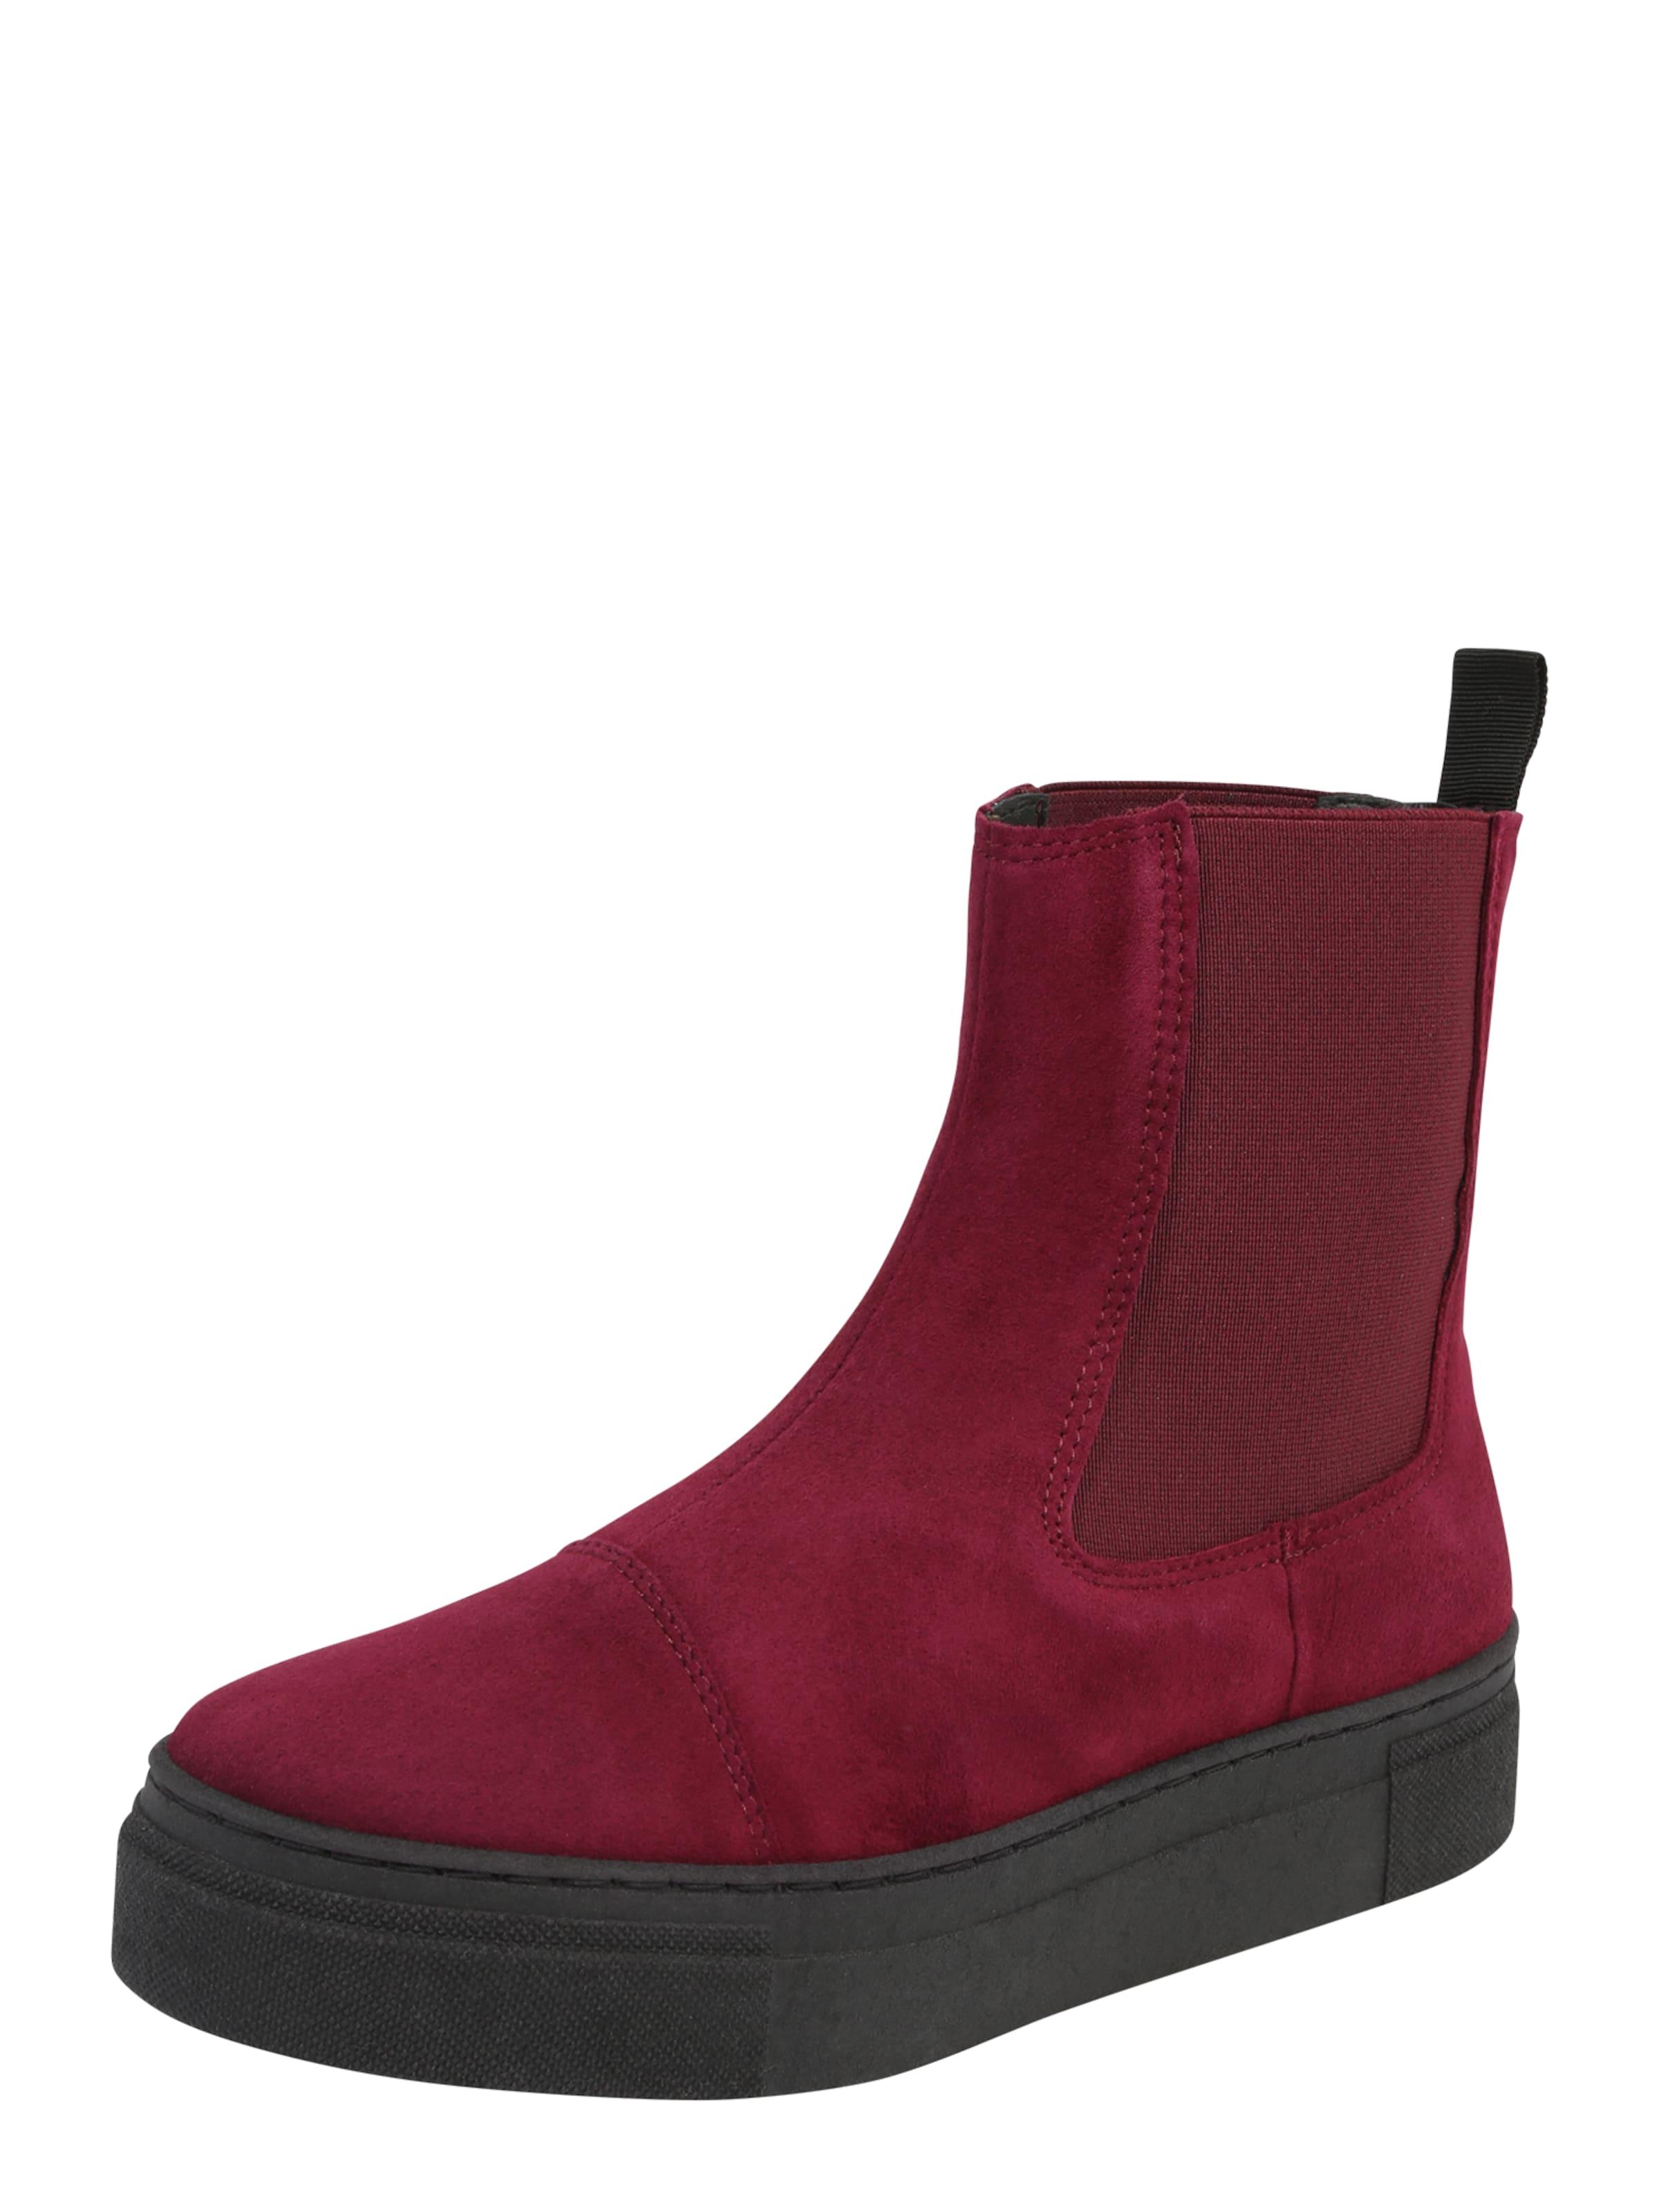 EDITED Sneaker Leony Verschleißfeste Verschleißfeste Leony billige Schuhe da7b53